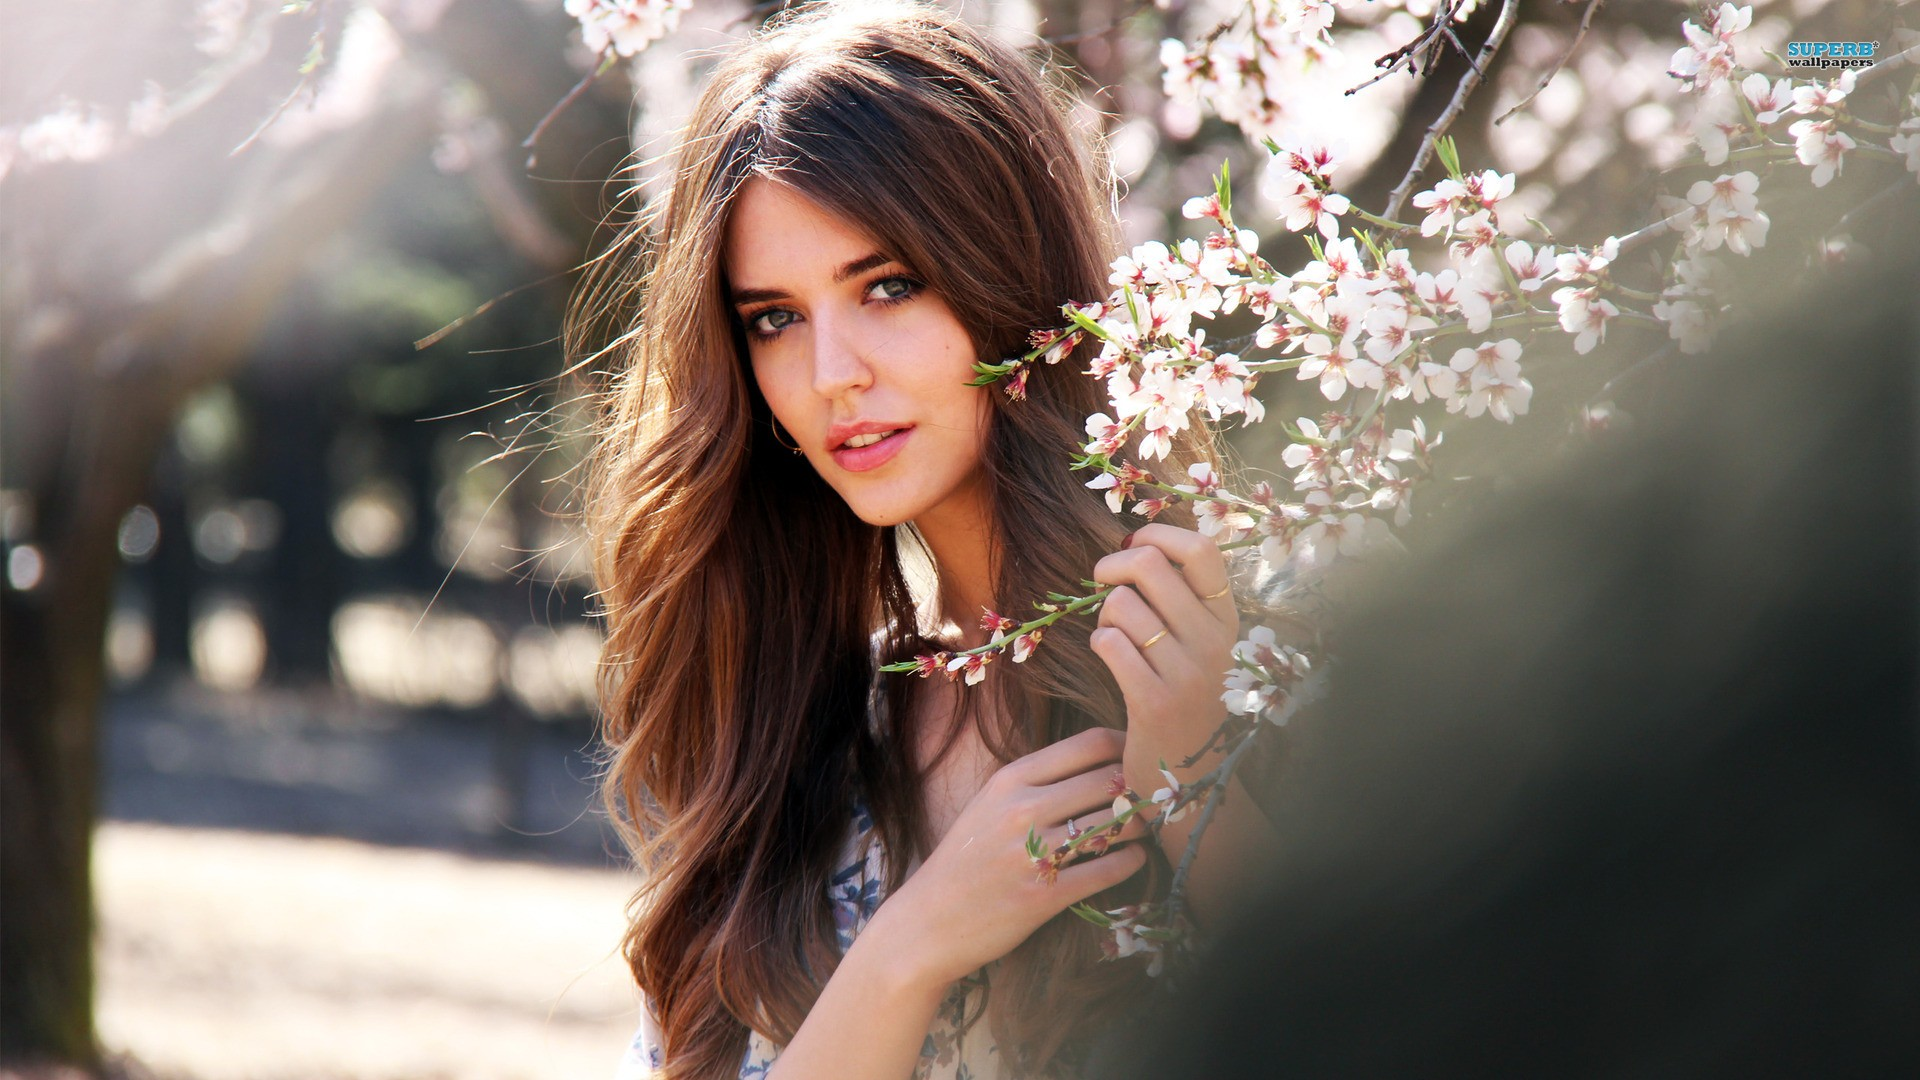 Awesome Beautiful Girls Hd Full Pics